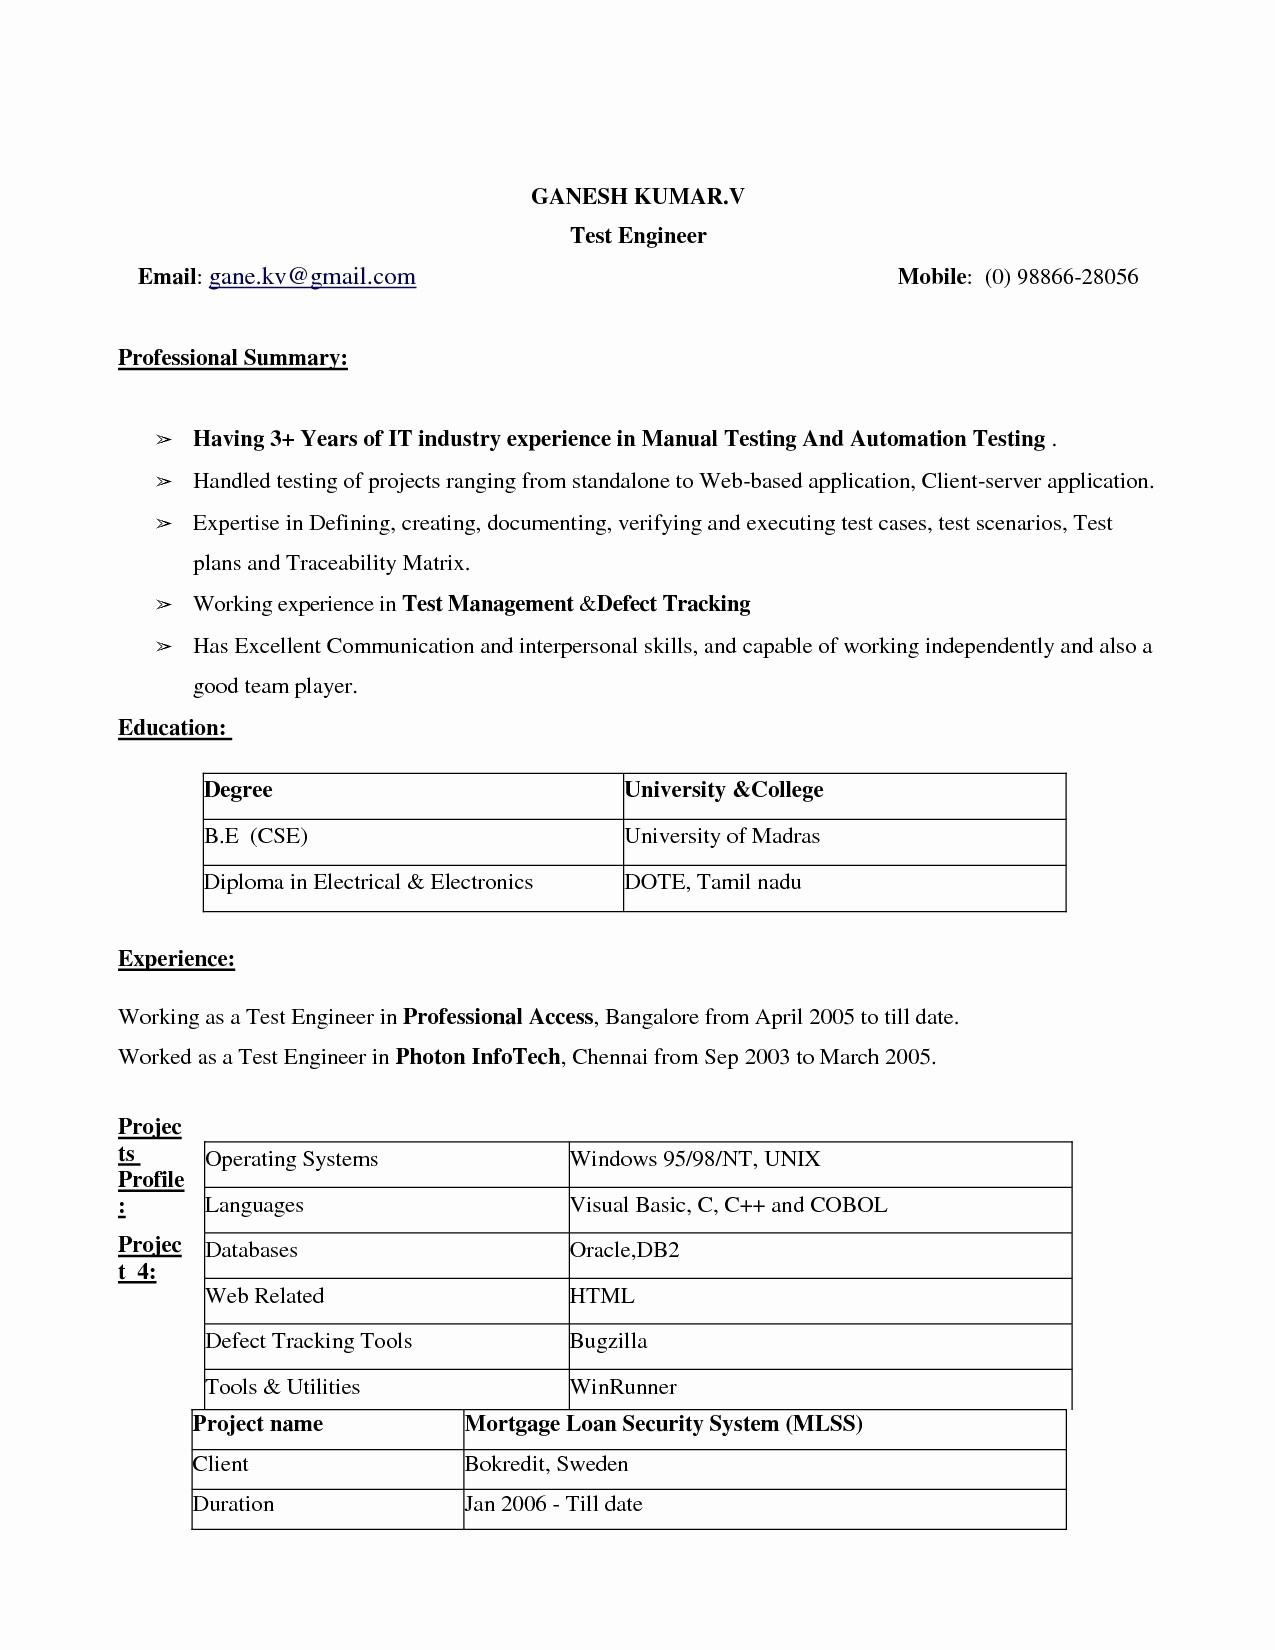 Microsoft Office Word Resume Templates Elegant Resume Template Microsoft Word 2017